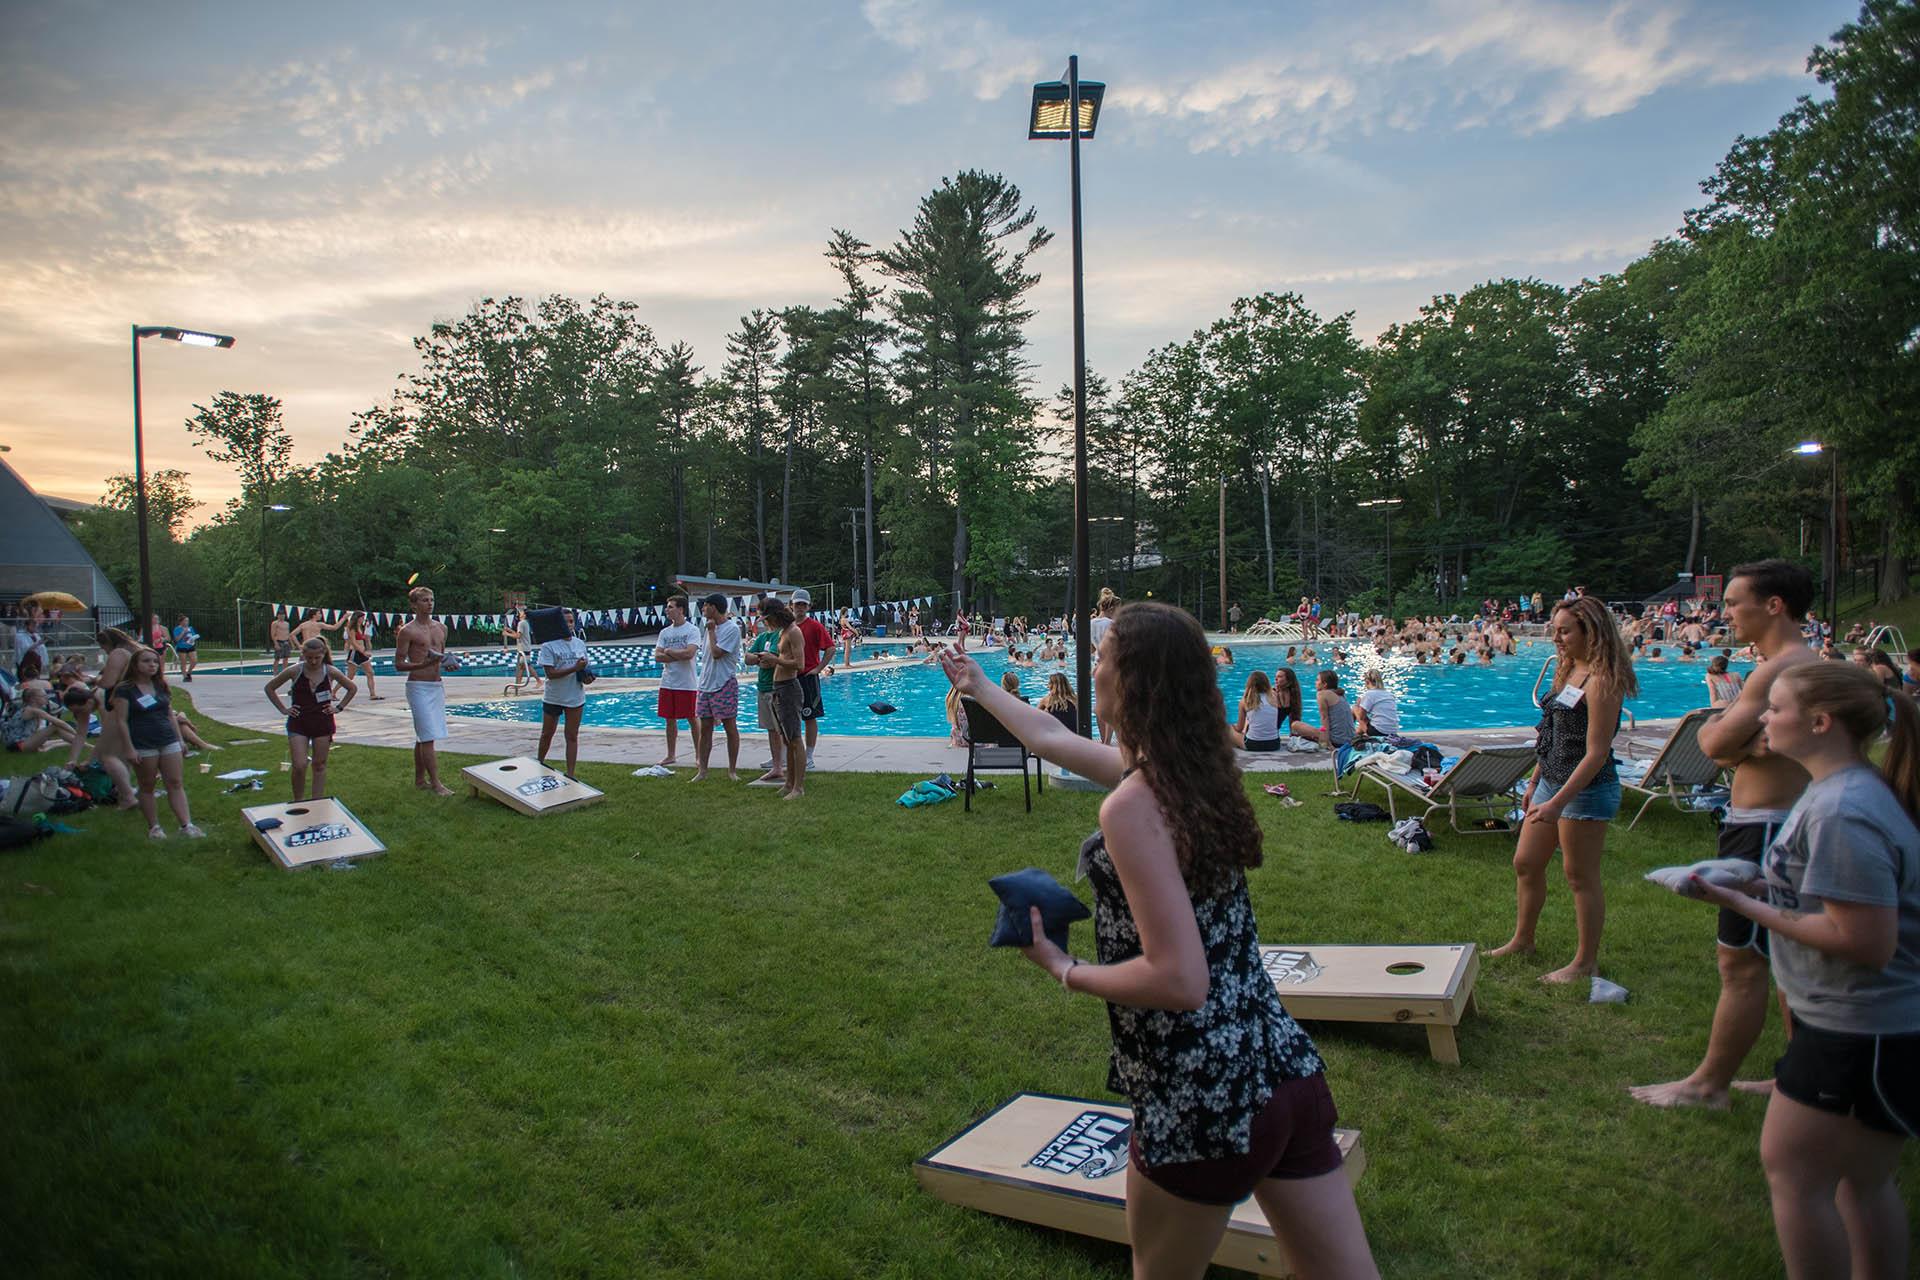 hamel-outdoor-pool.jpg